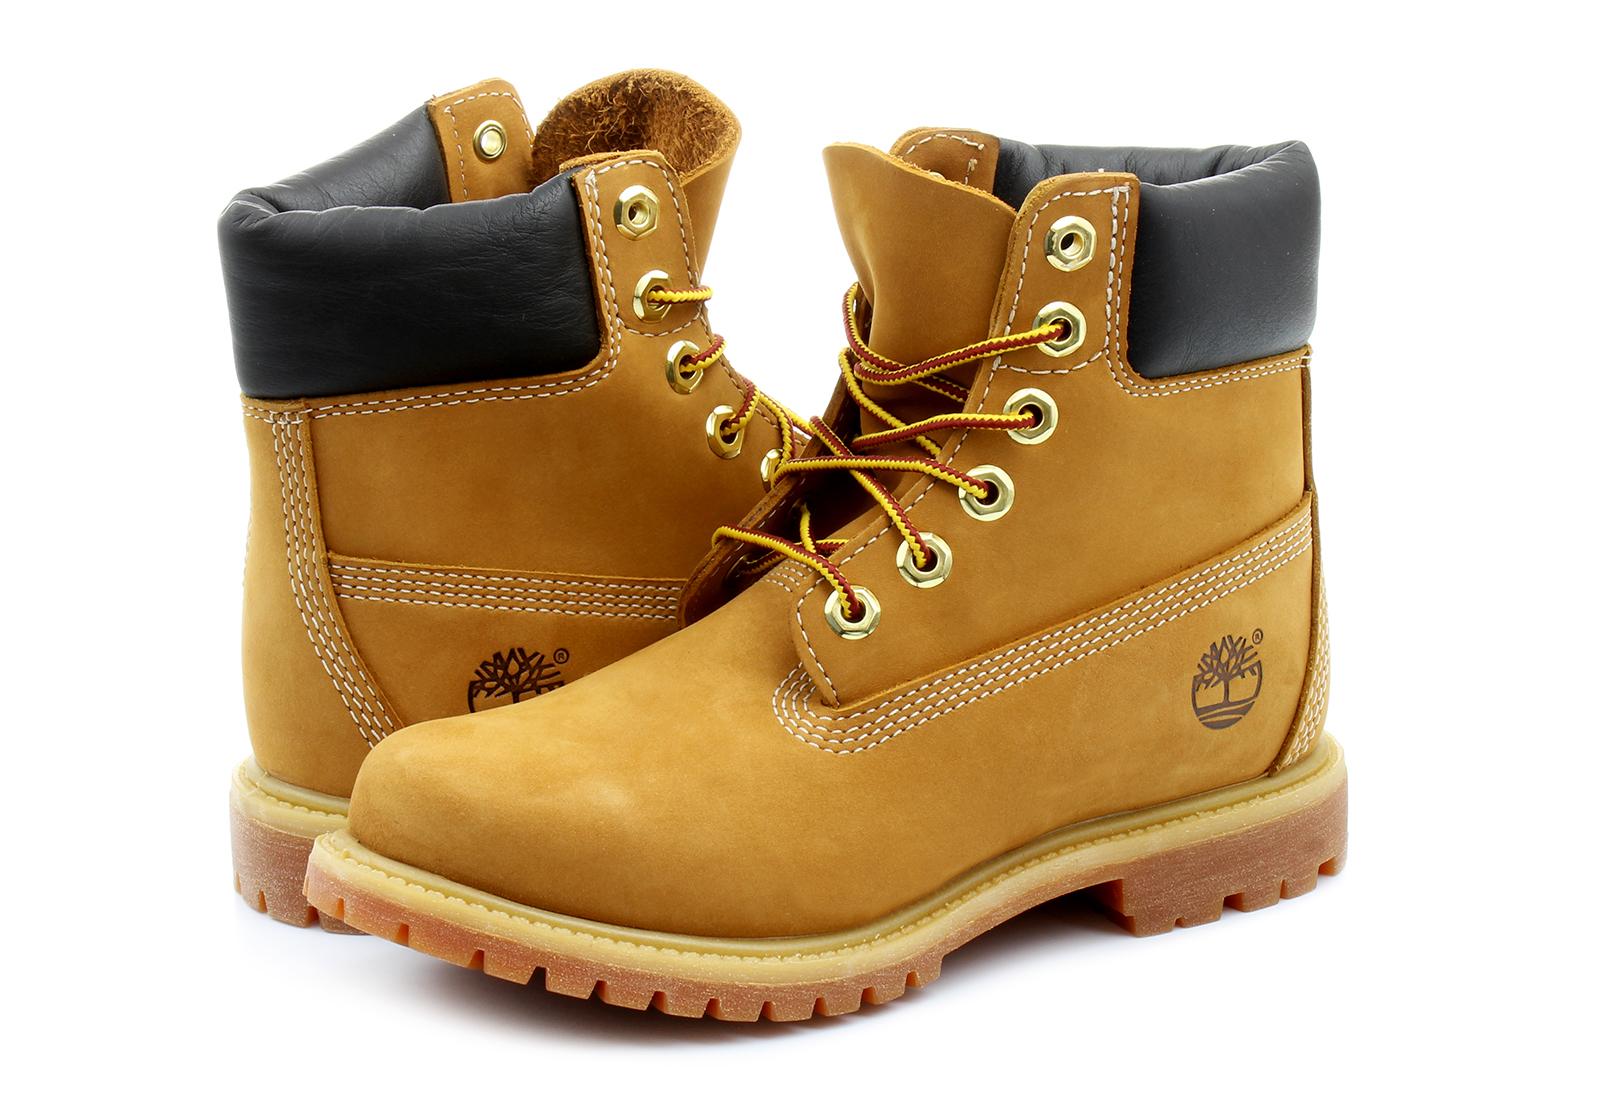 Timberland Boty Farmářky - 6in Prem Boot - 10361-wheTenisky 67e038842f